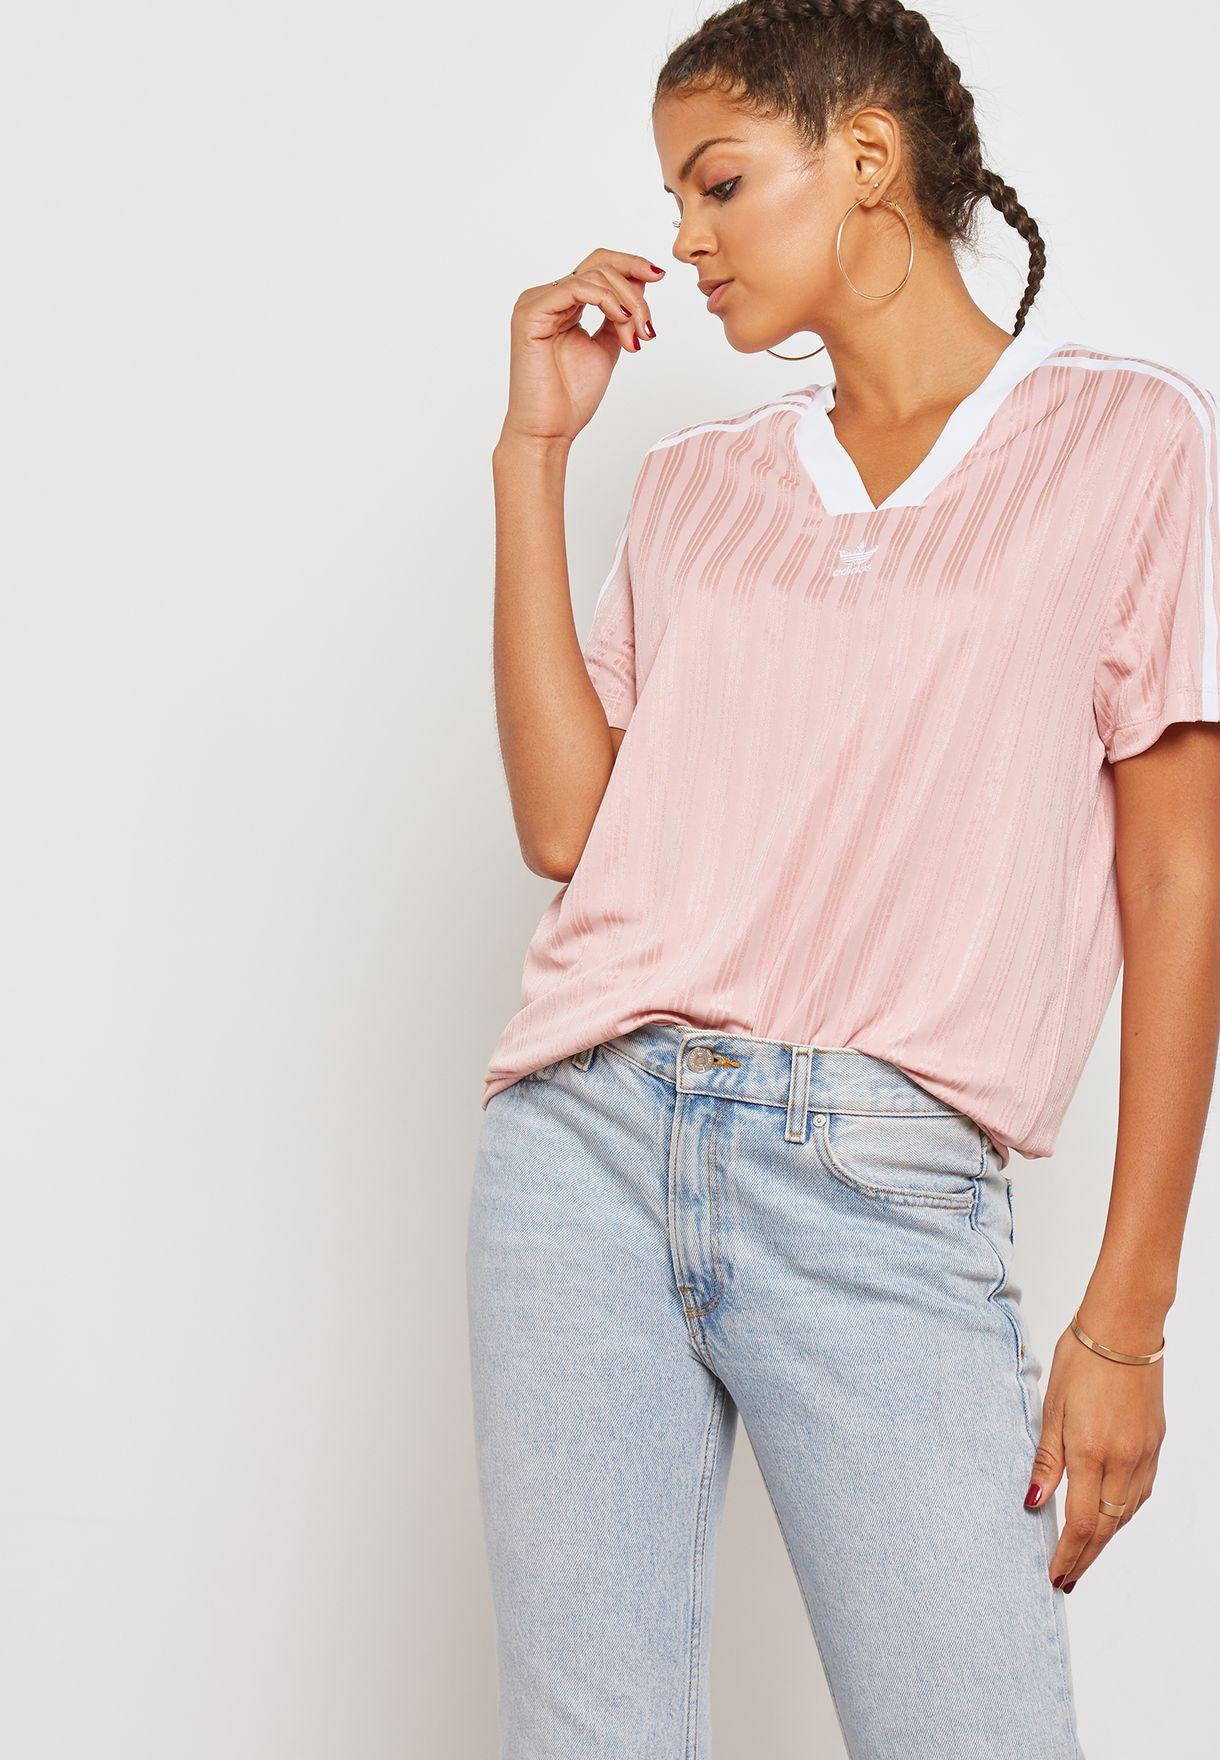 1db1a80f81c2 Shop adidas Originals pink adicolor Football T-Shirt DN8135 for Women in  Oman - AD478AT39KGU